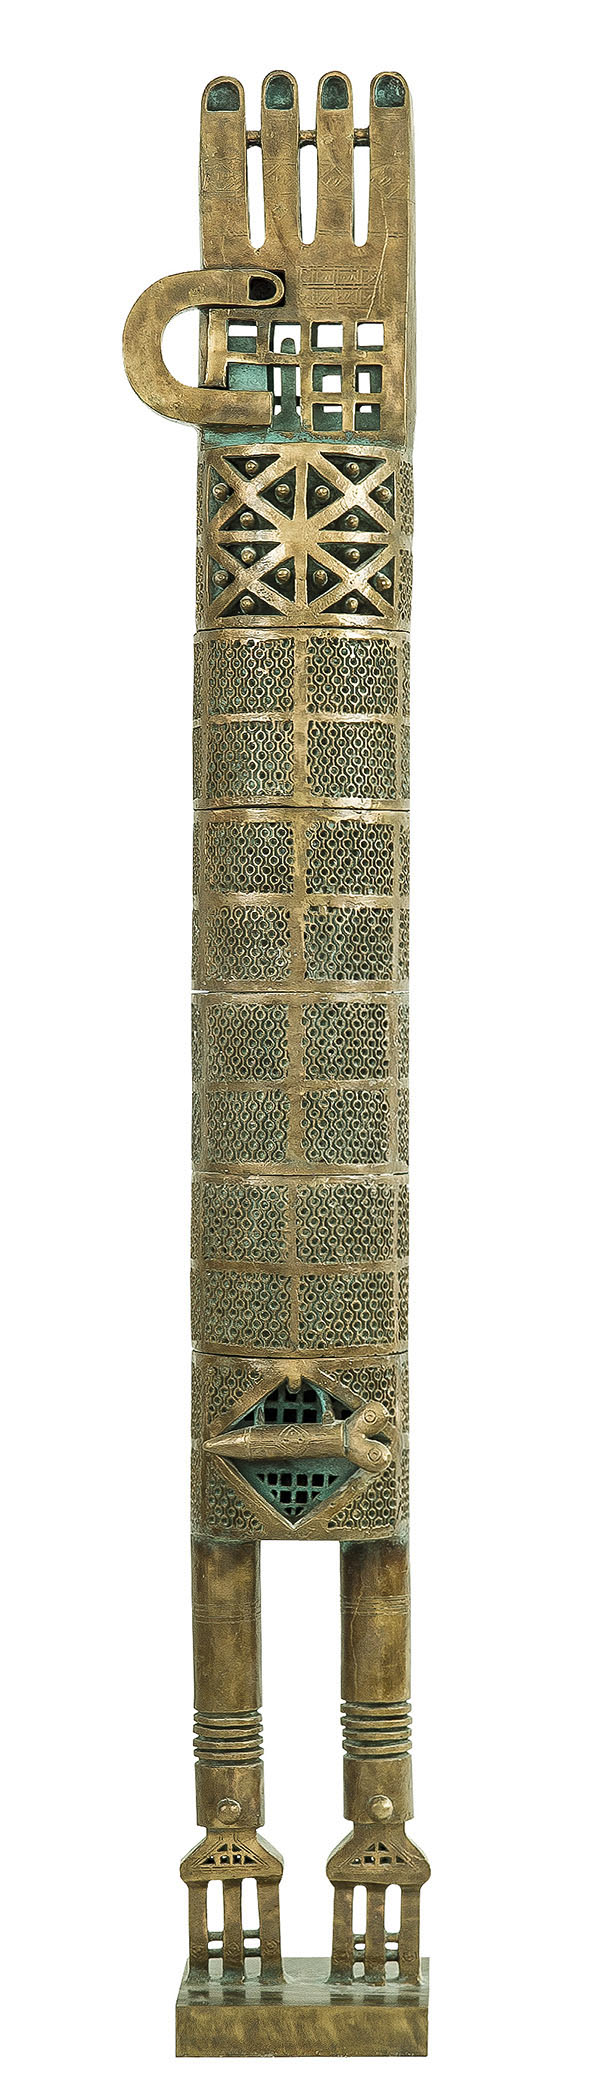 Parviz Tanavoli, The Poet, 1973. Bronze. Collection of the artist. Photograph- John Gordon (300)